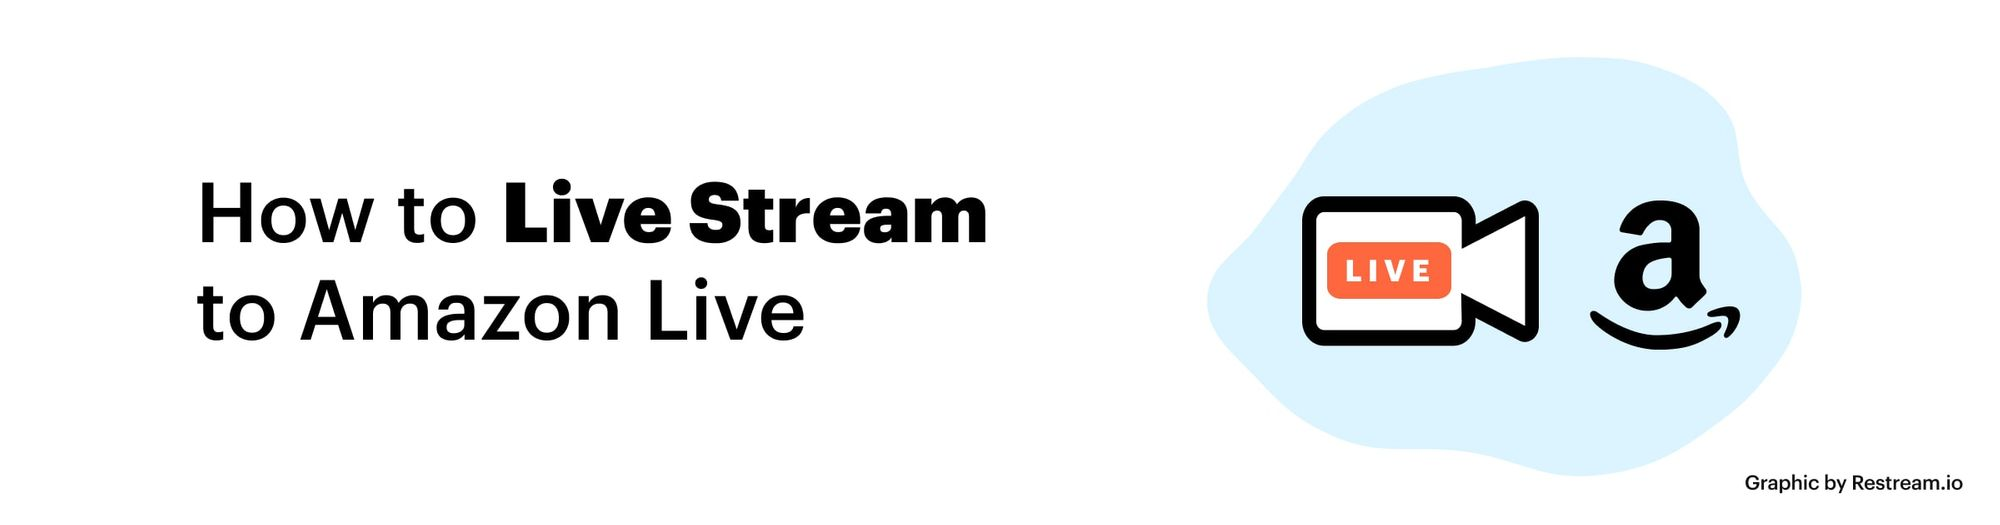 How to live stream to Amazon Live